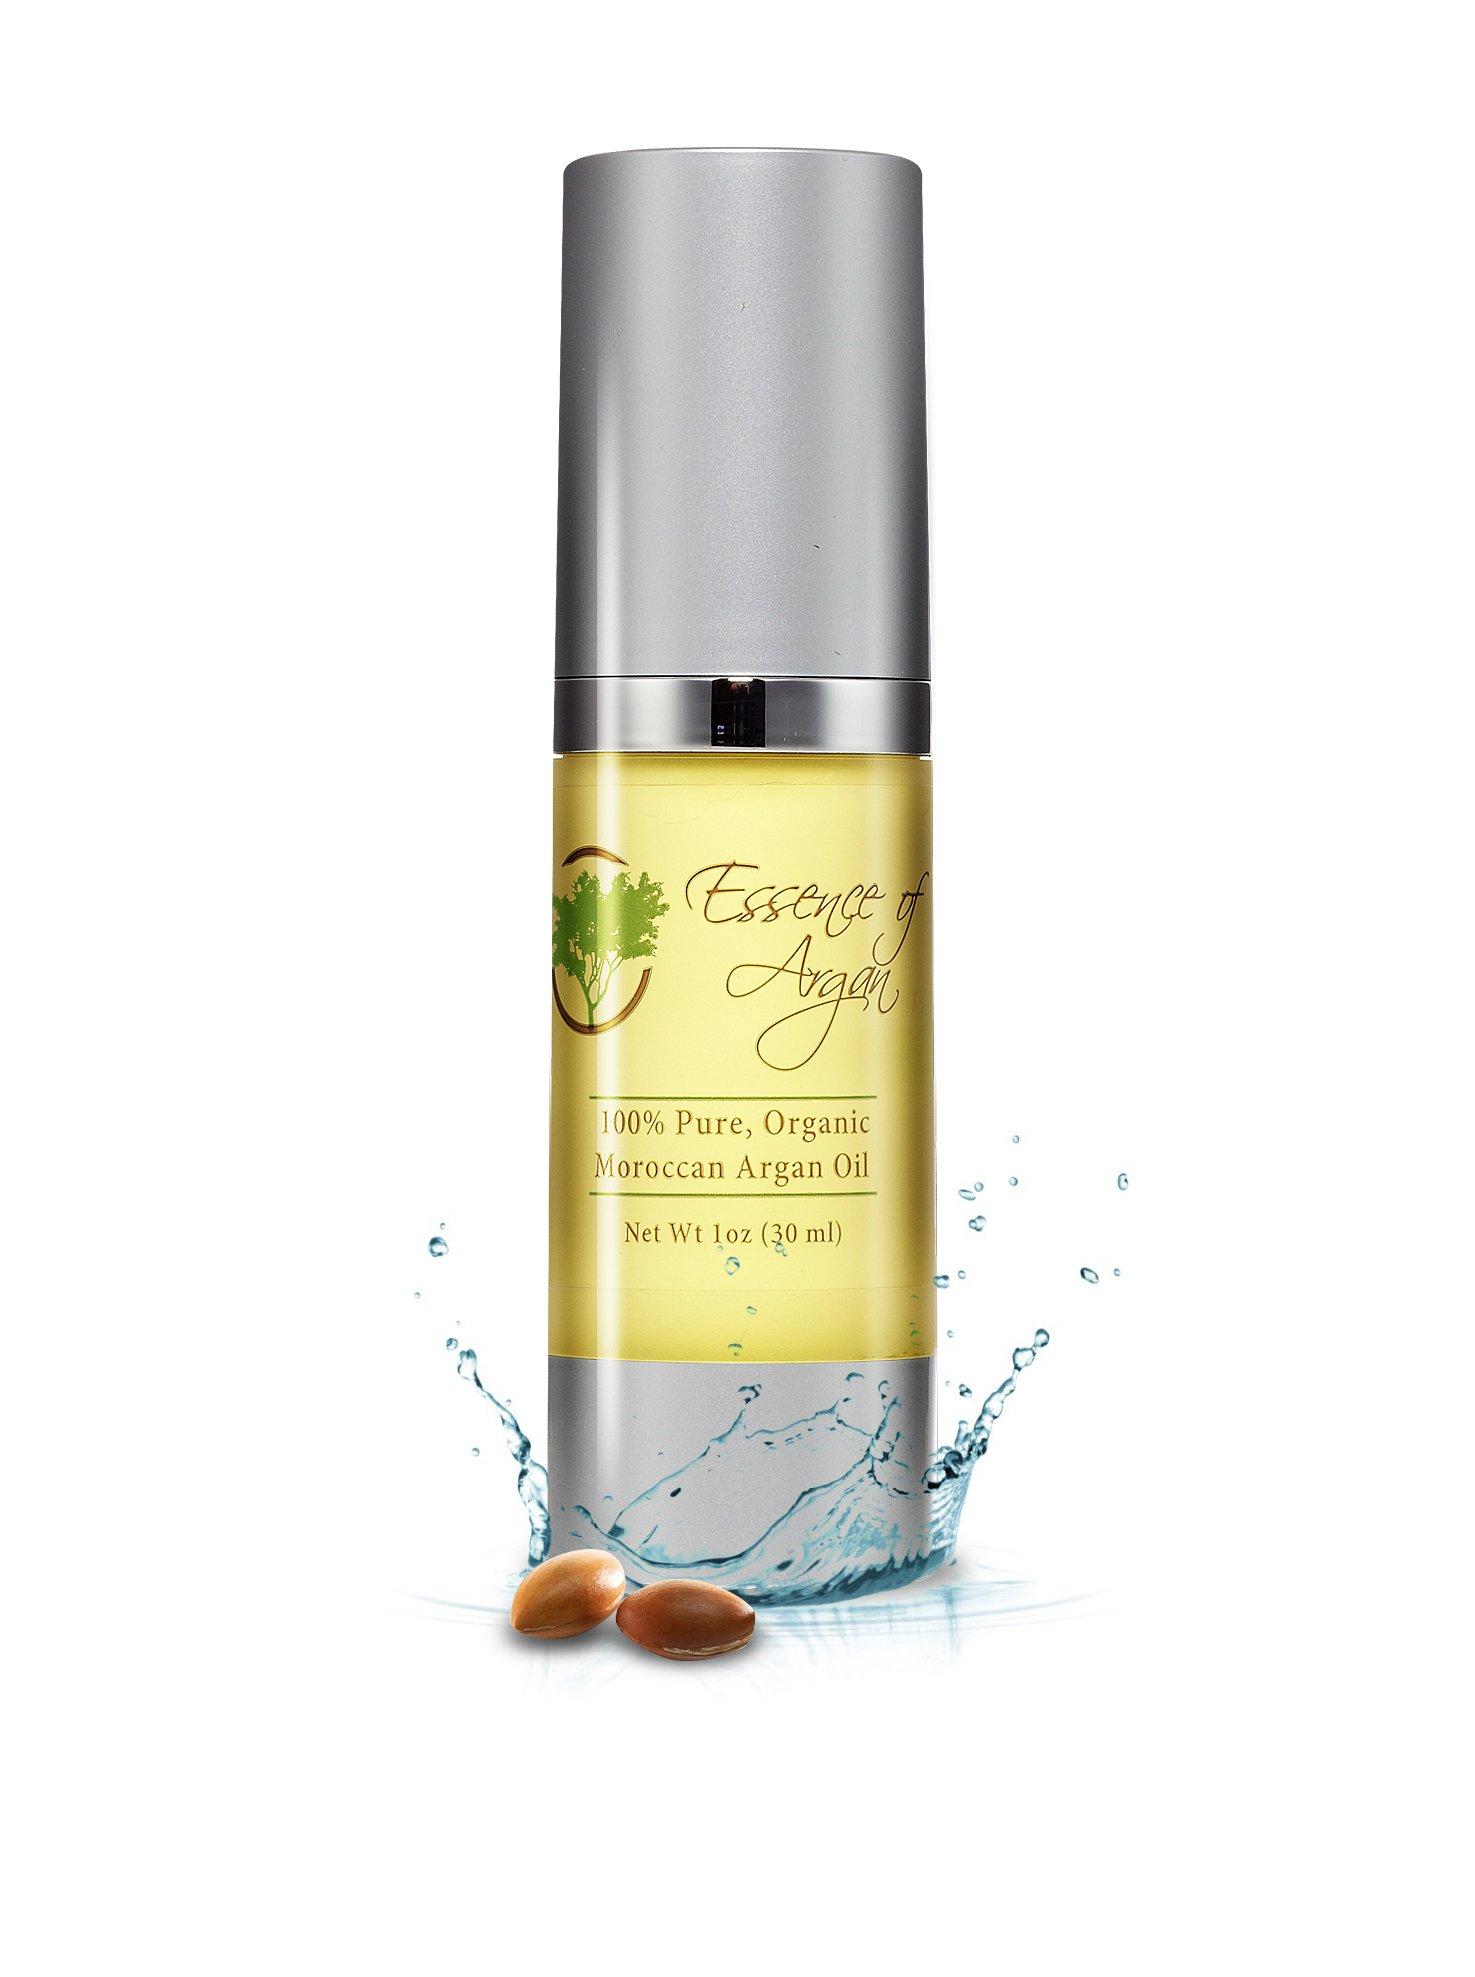 Essence of Argan Pure Organic Moroccan Argan Oil, 30 ml